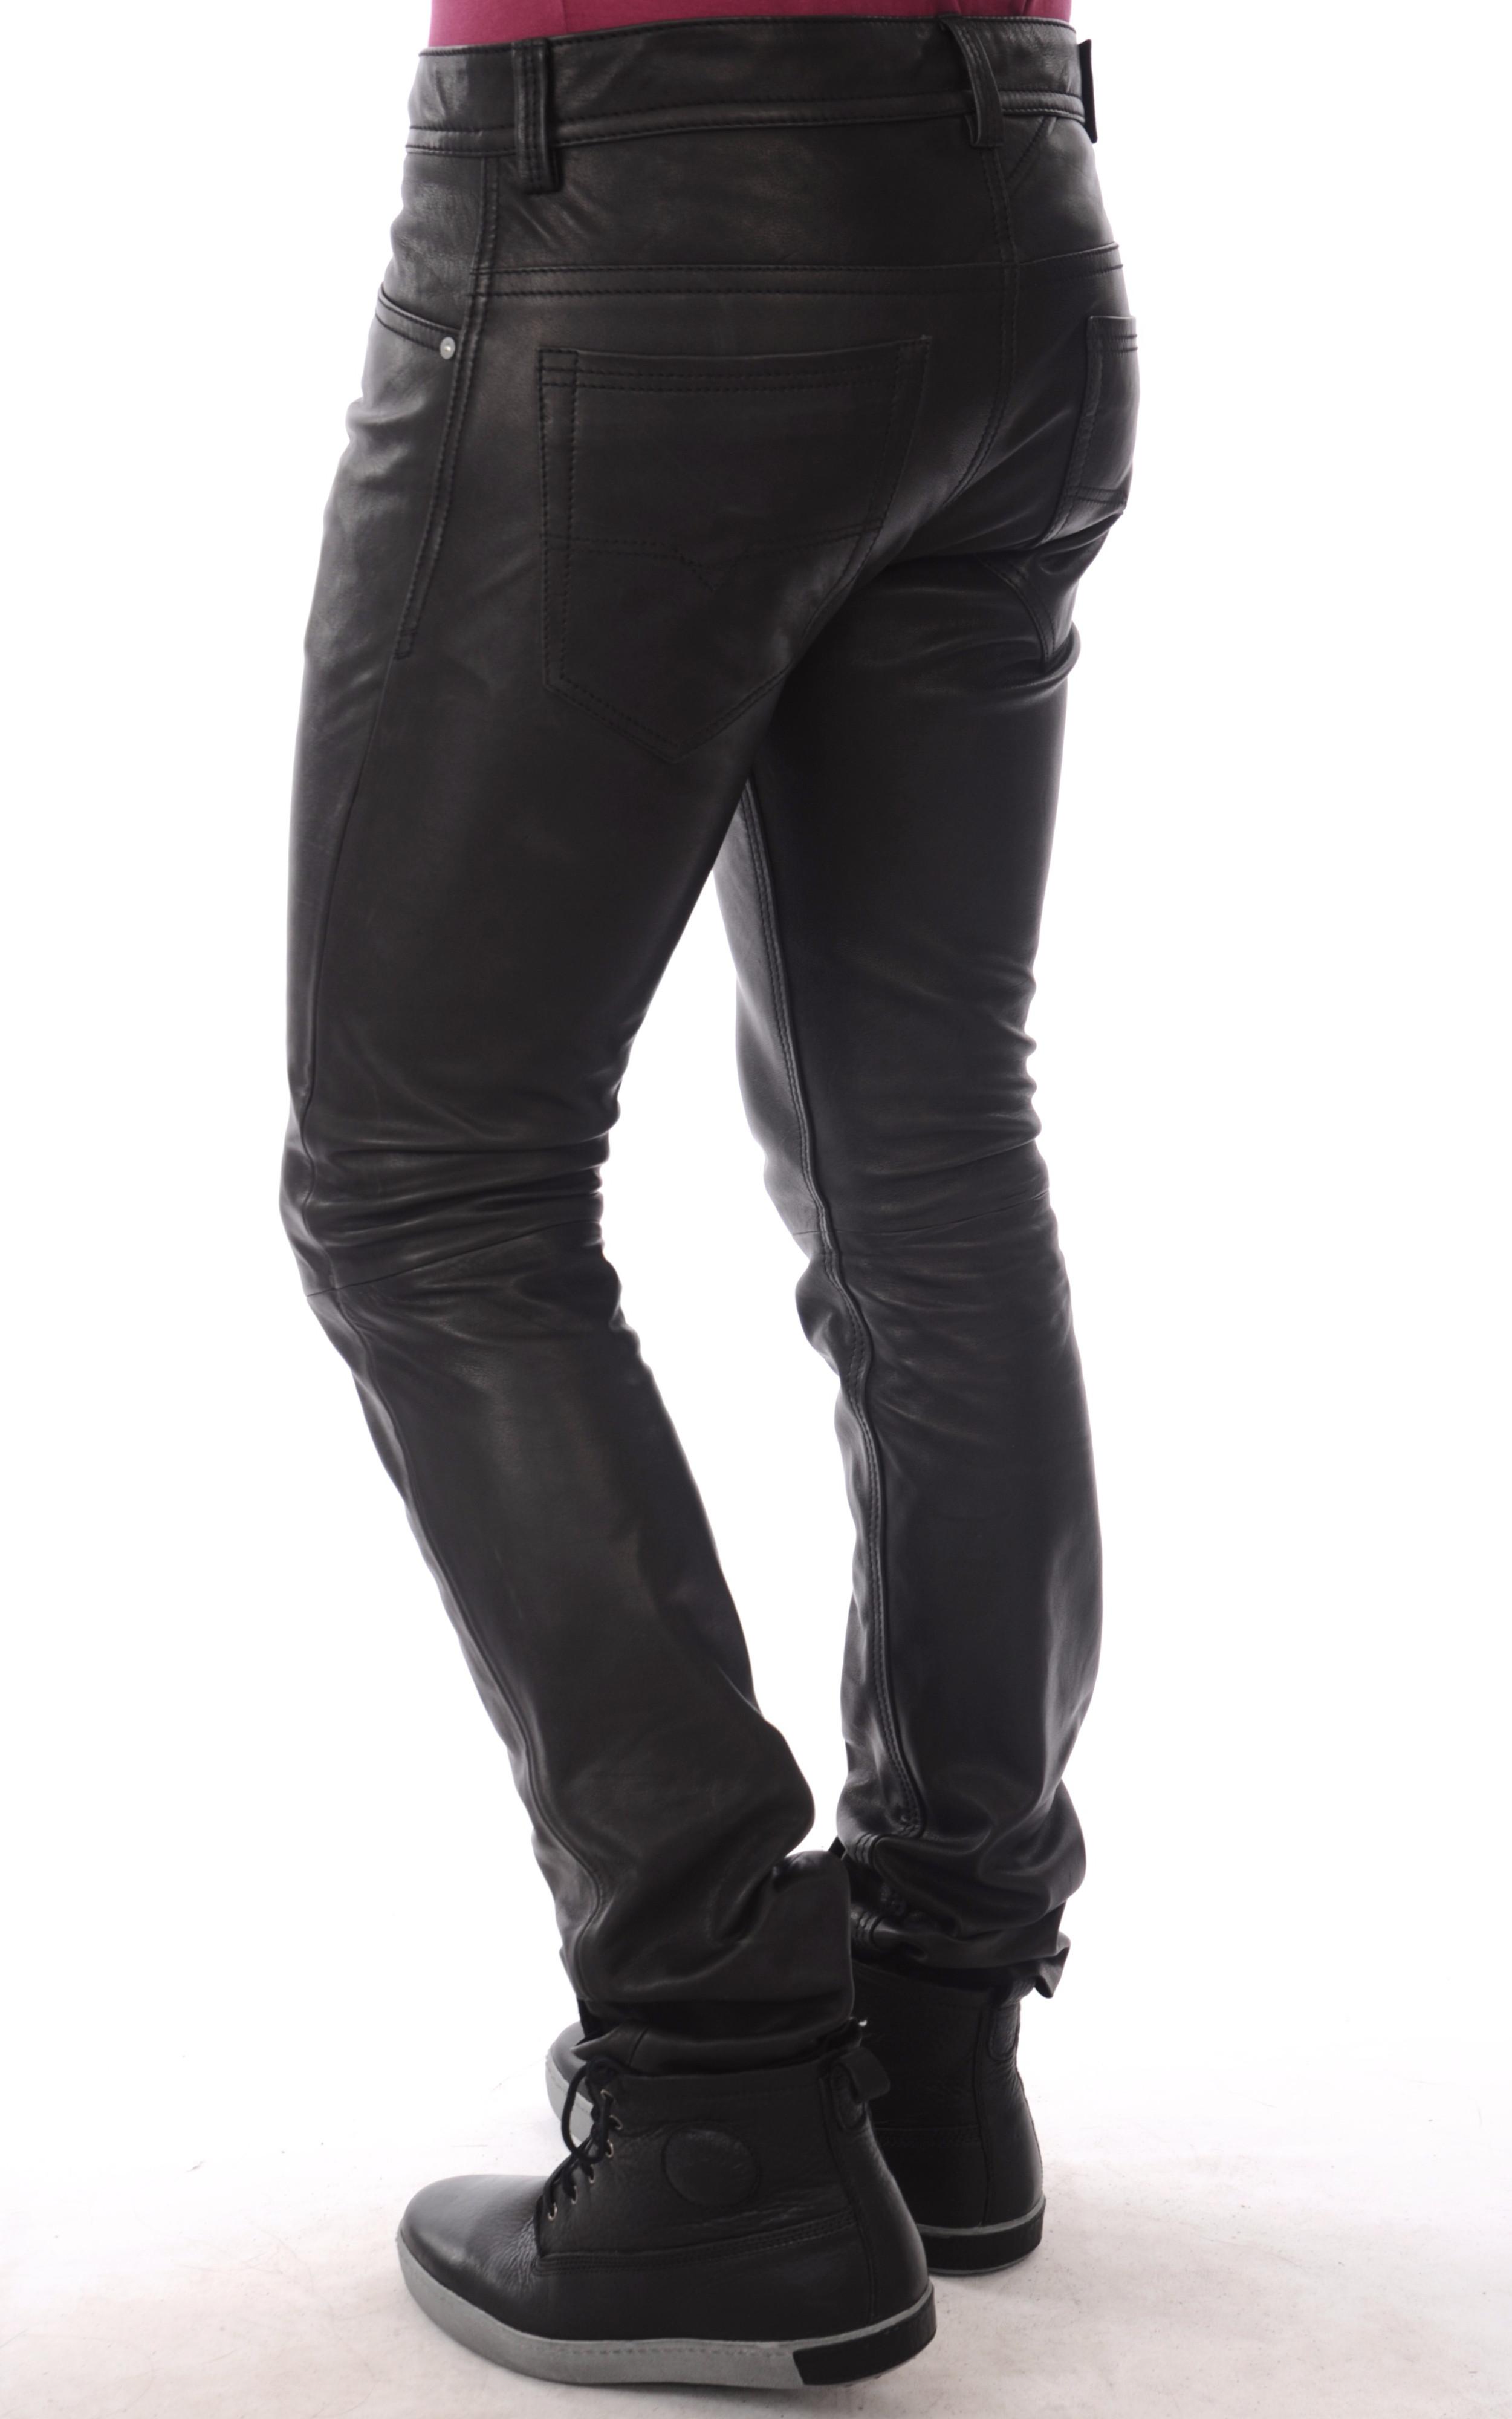 pantalon cuir slim 5 poches. Black Bedroom Furniture Sets. Home Design Ideas